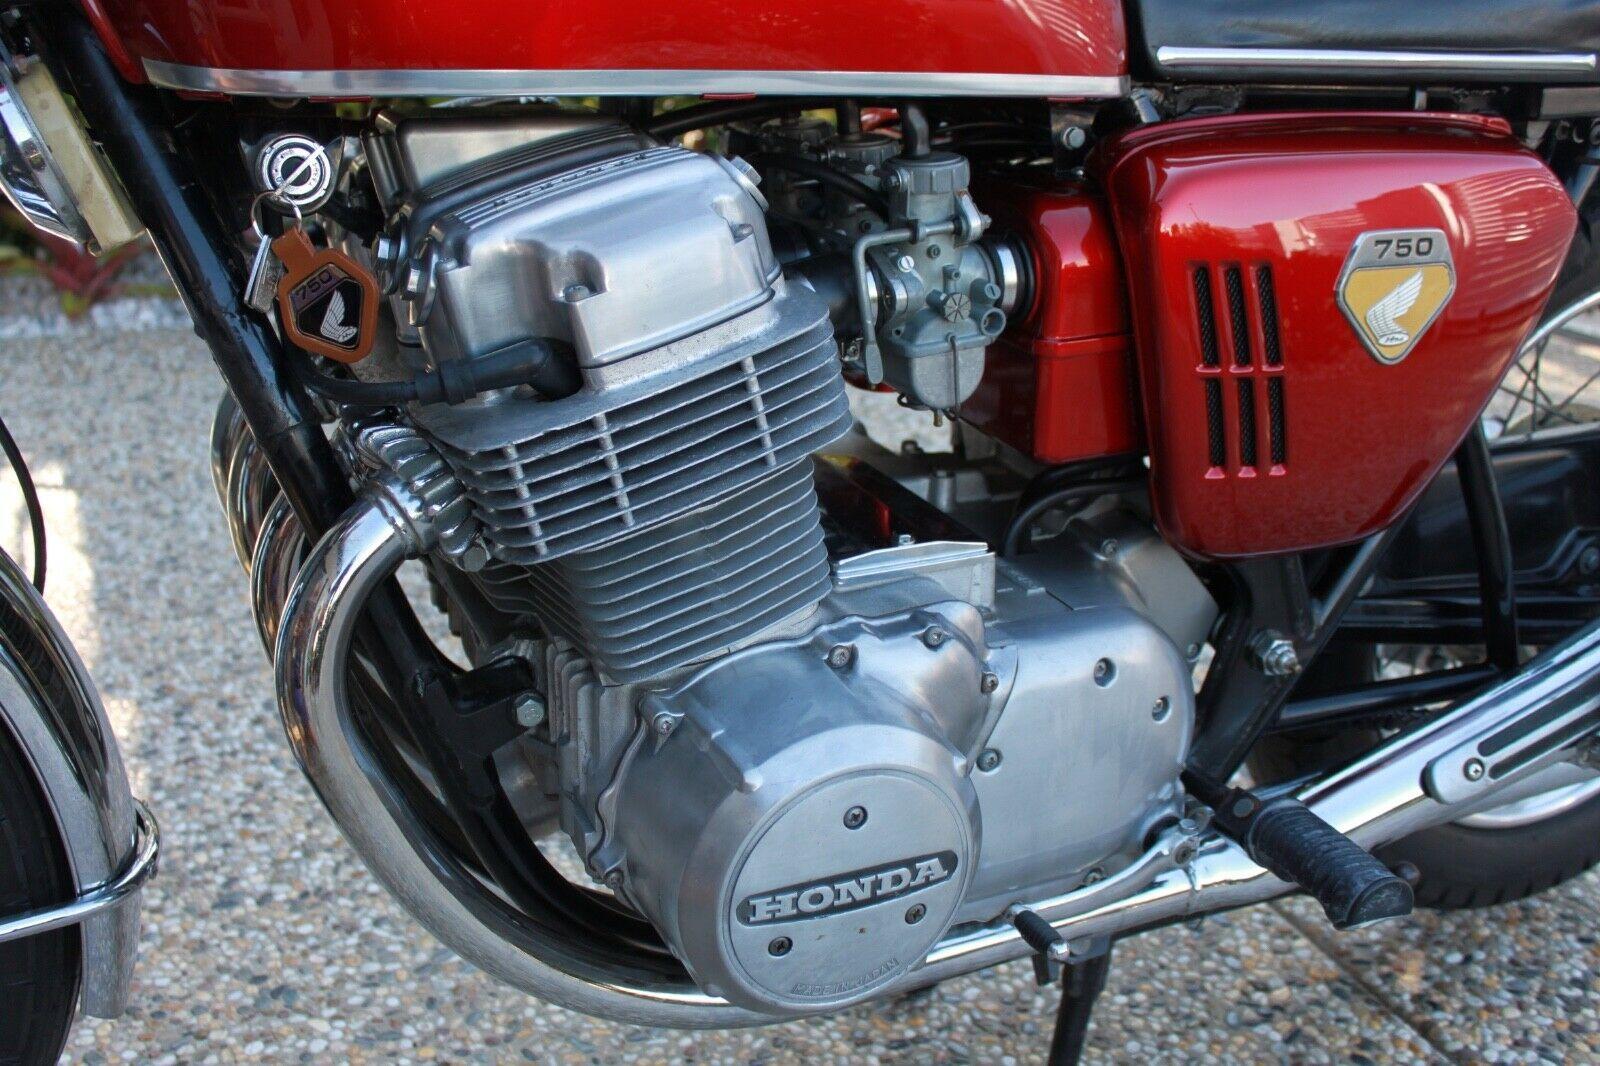 1969 Honda CB750 Sandcast K0 engine